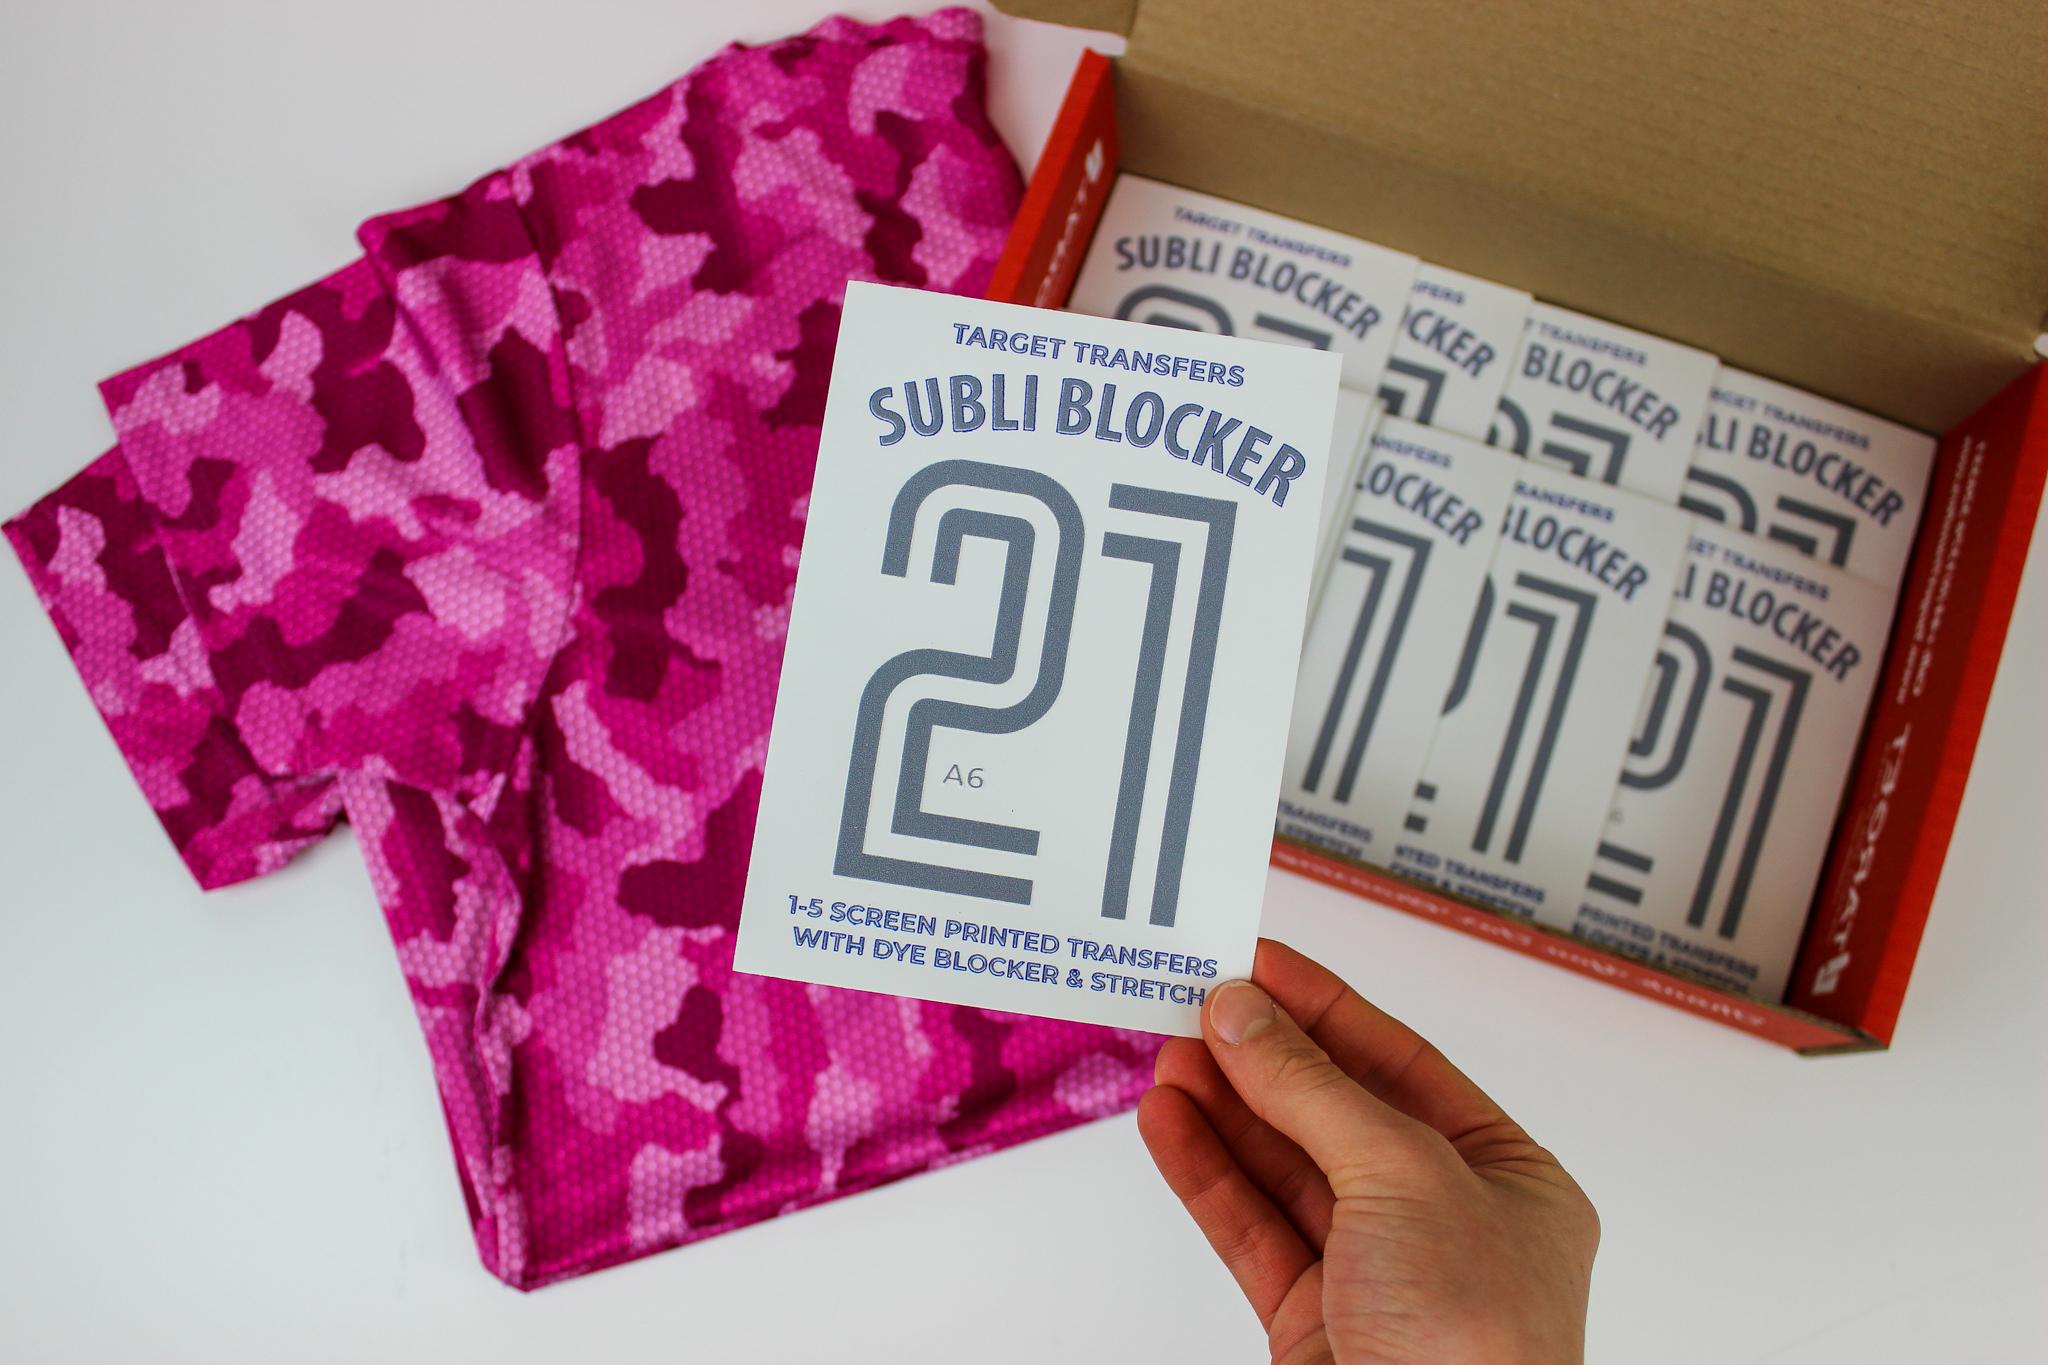 subli blocker transfers